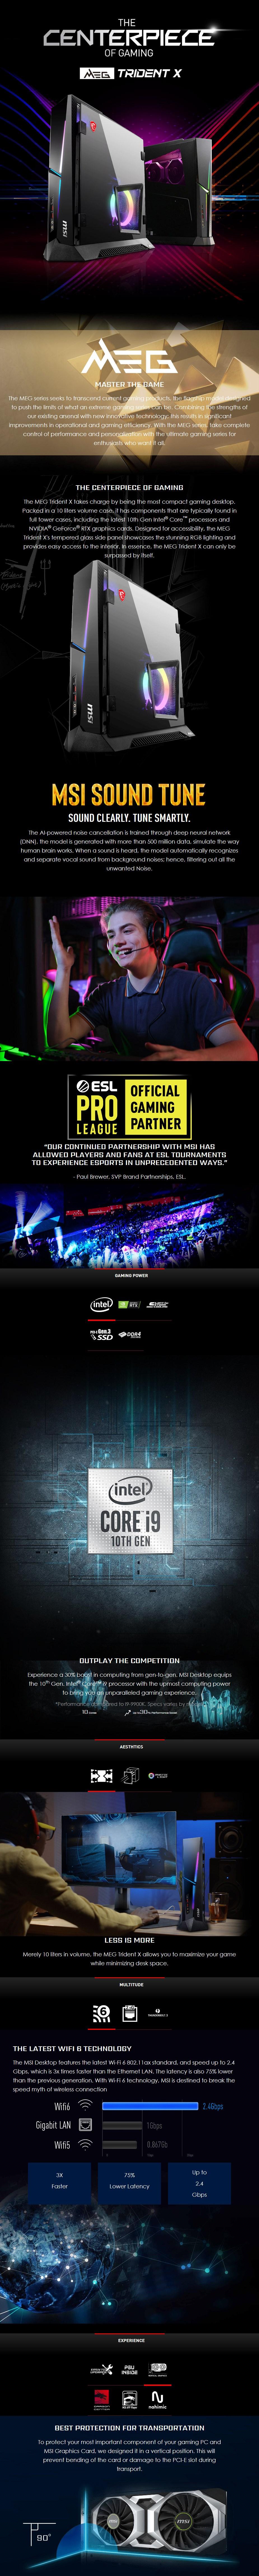 MSI MEG Trident X Gaming PC i9-10900K 32GB 2x 1TB SSD RTX3080 W10H - Overview 1